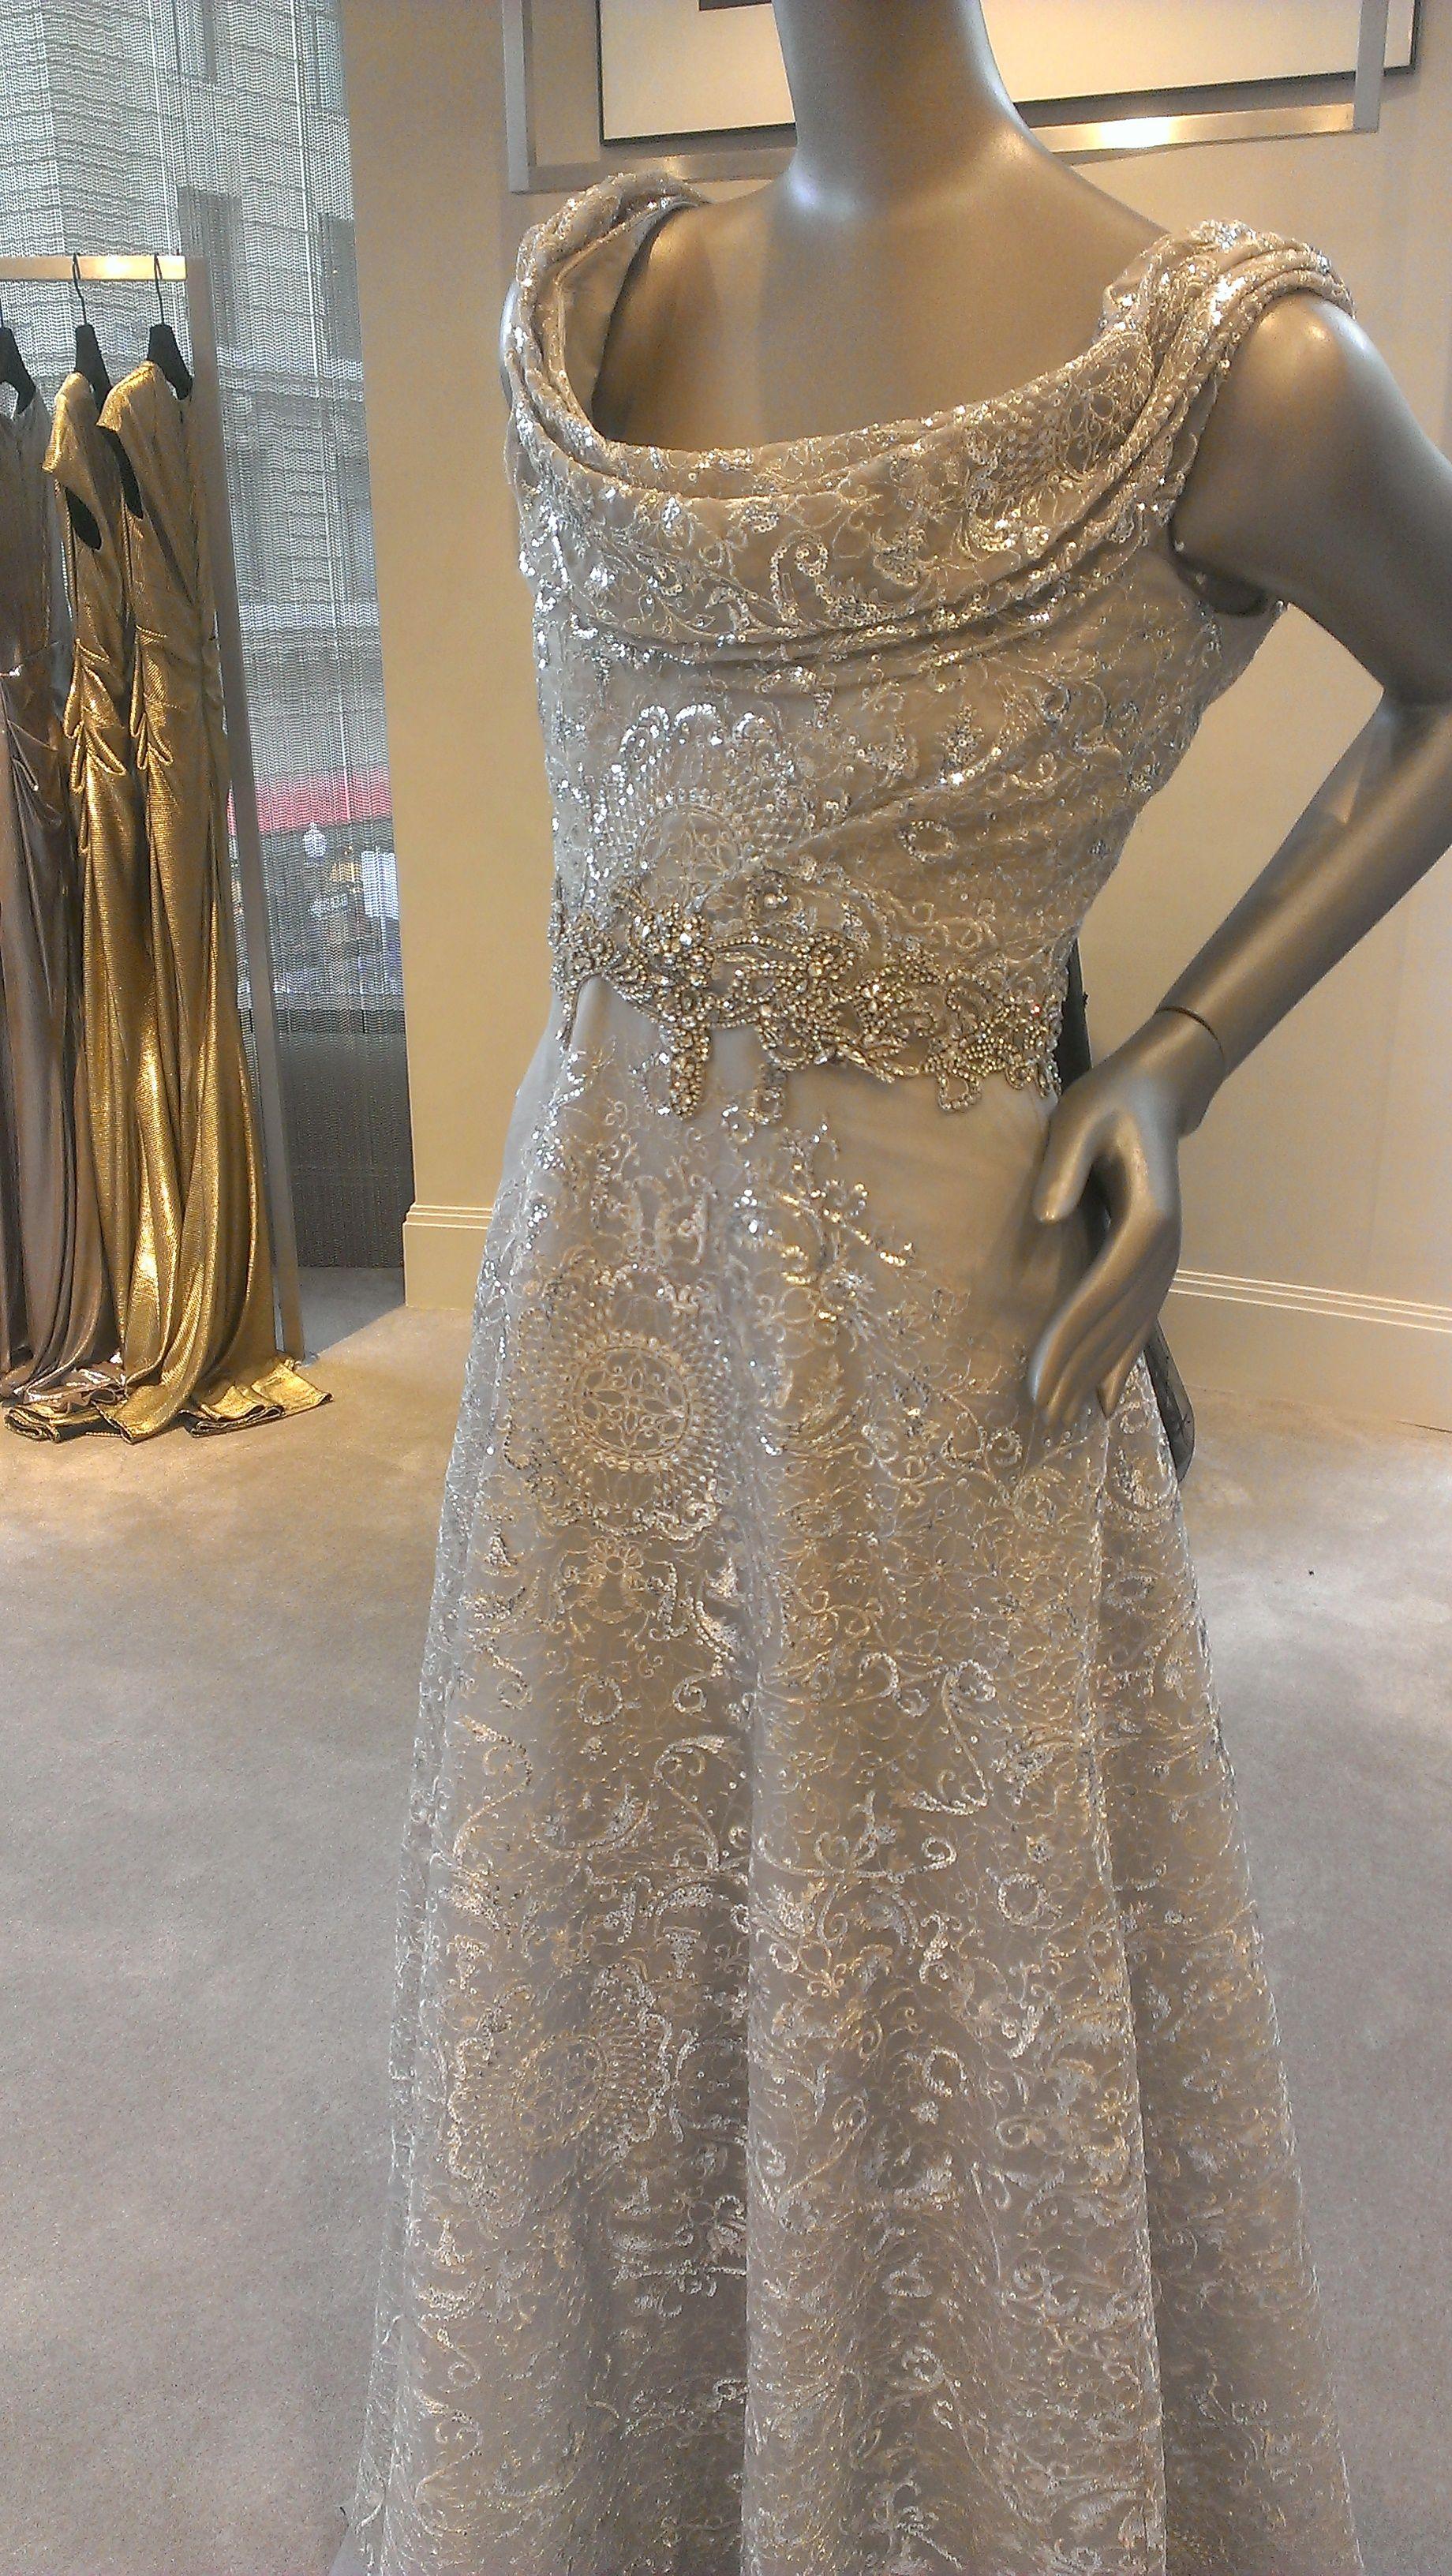 Talbot Runhof gown at Saks Fifth Avenue, Union Square, San